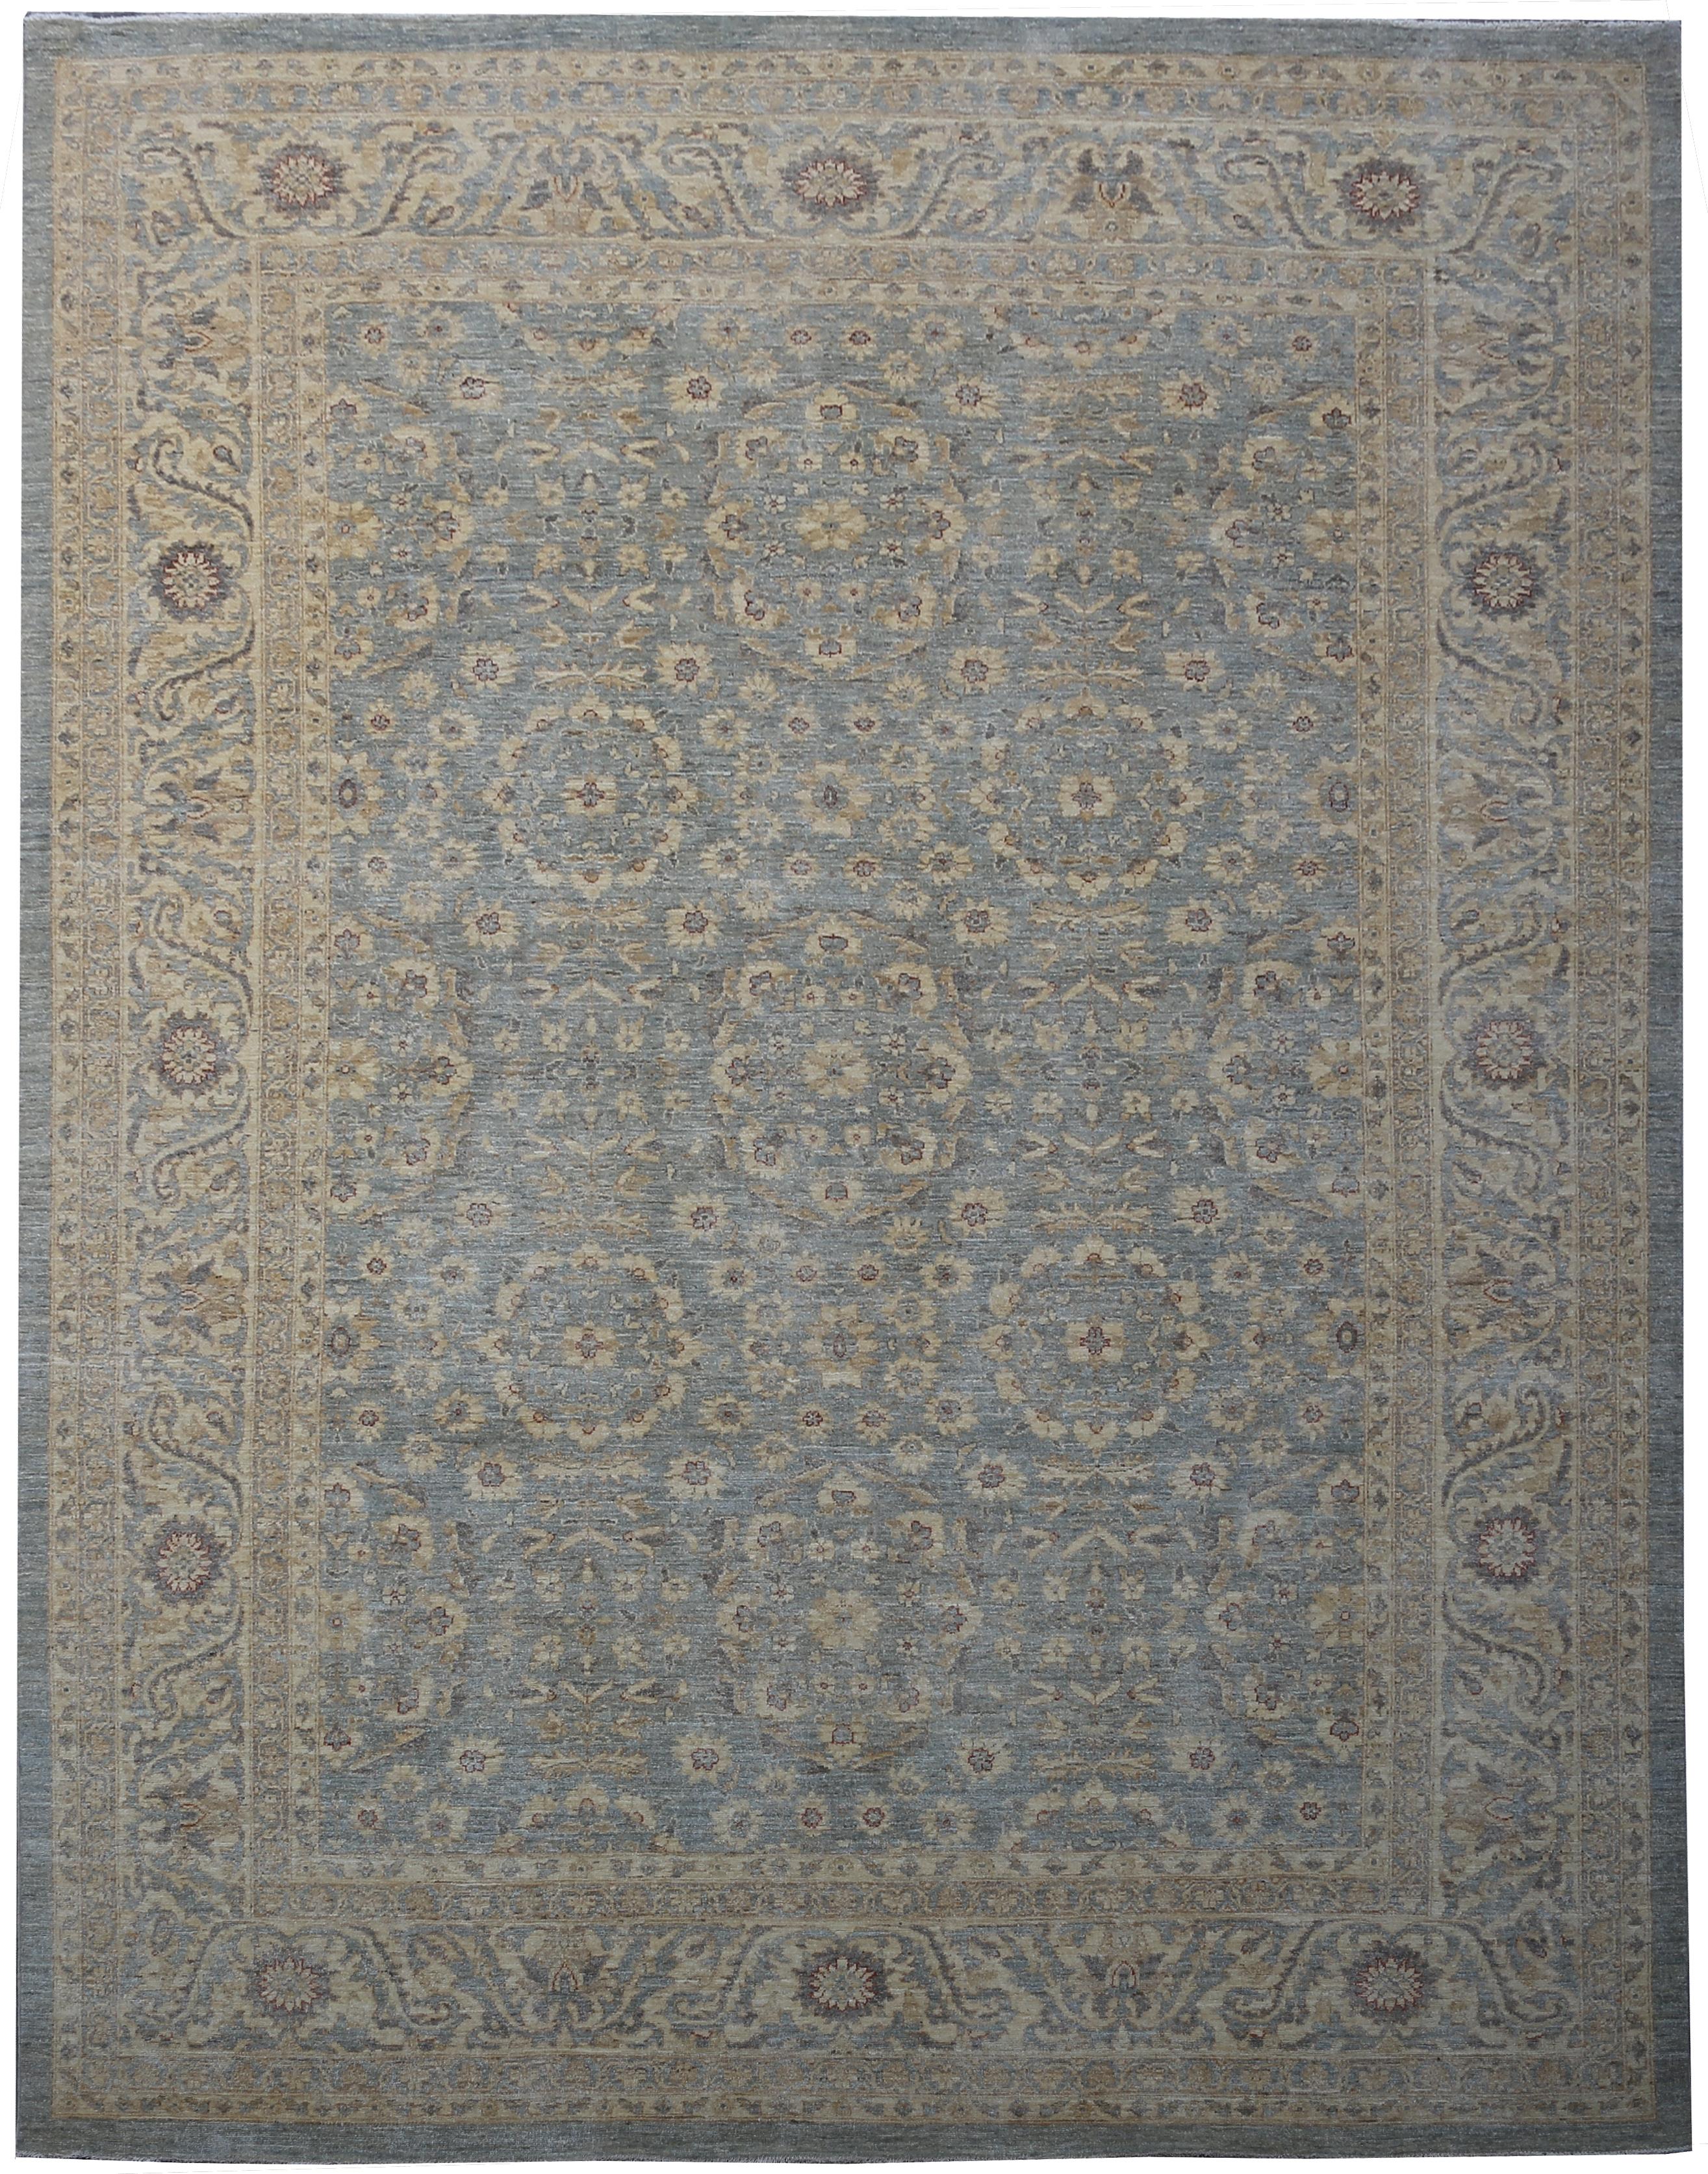 Handmade Antique Textured Oushak Ziglar Carpet 9x12 Chobi